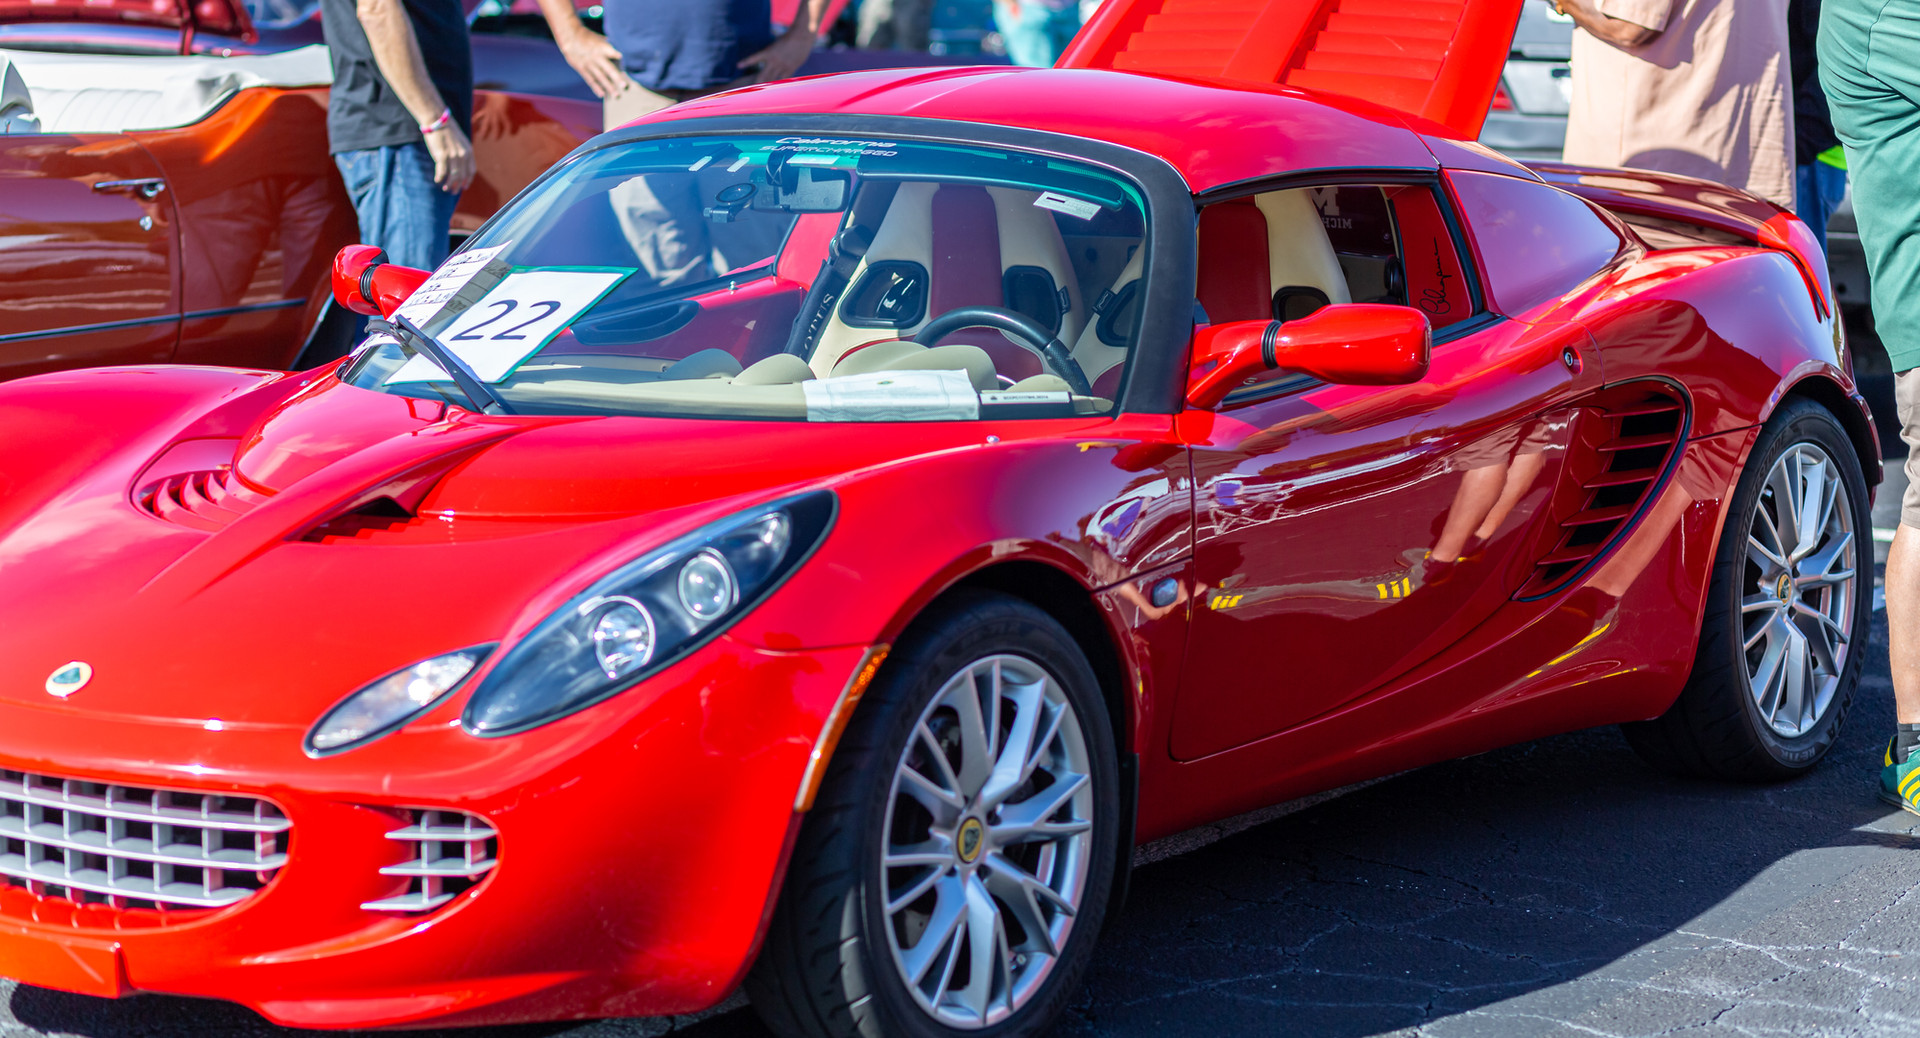 BH Art Fest Car Show 19 (81 of 109).jpg